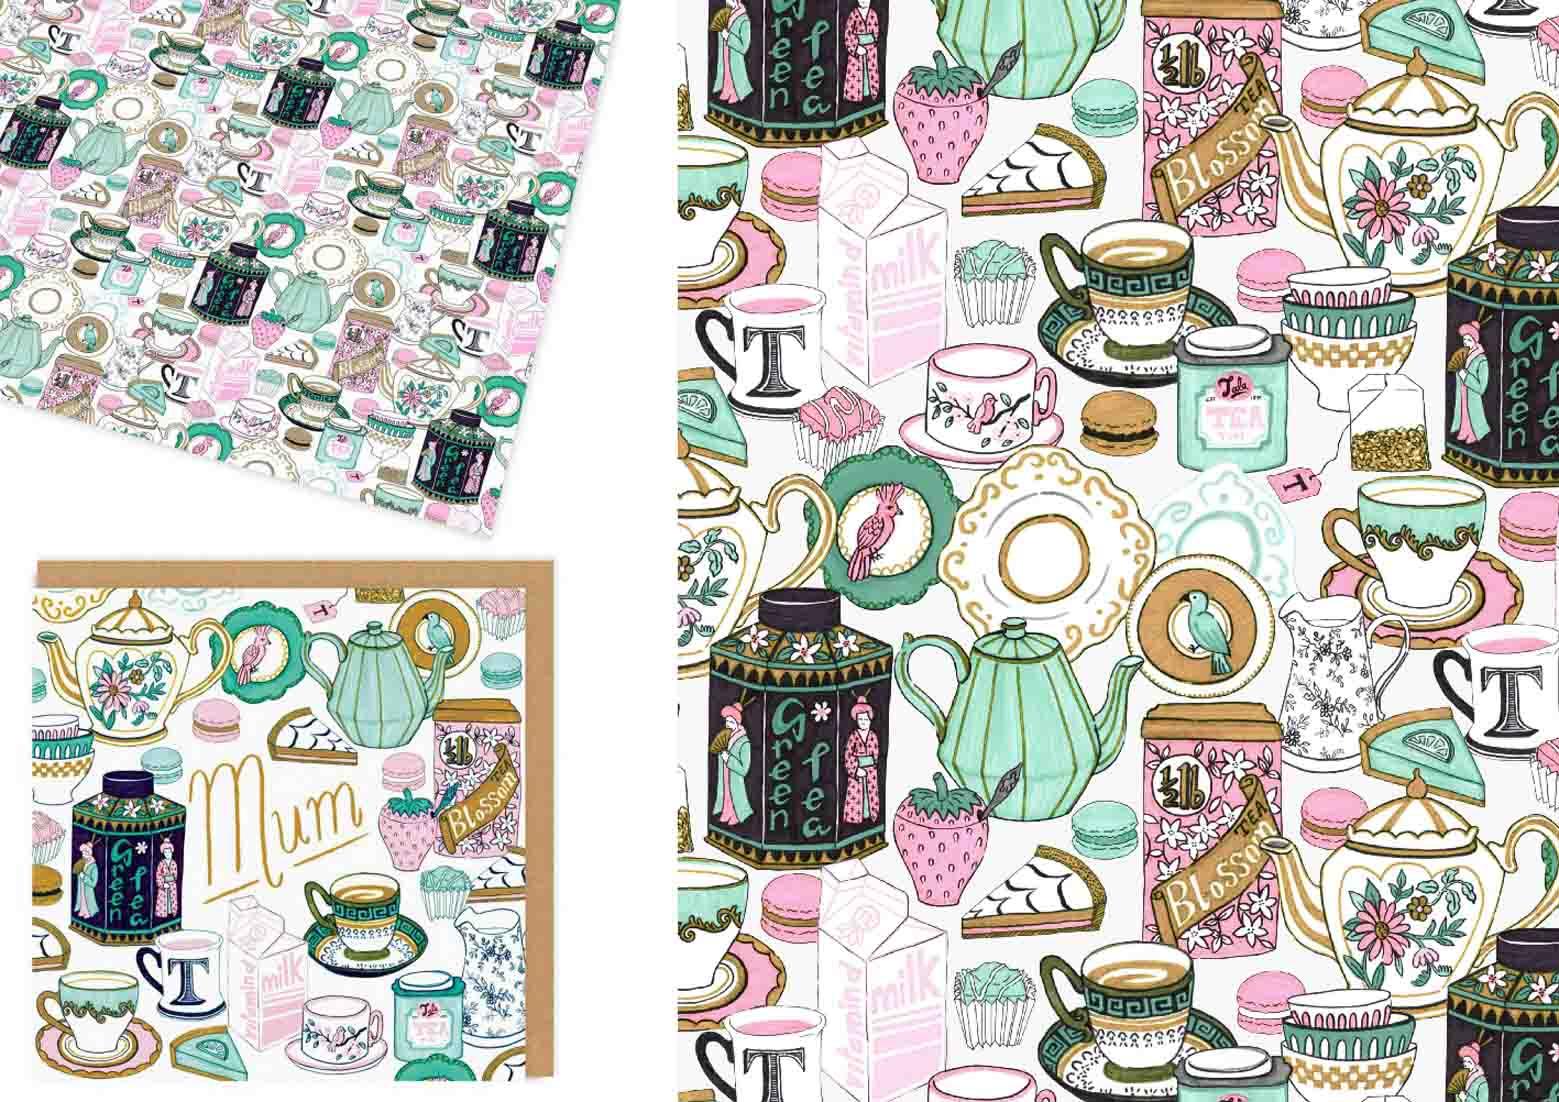 Jacqueline-Colley-for-Ohh-Deer-Tea-Pattern-1.jpg